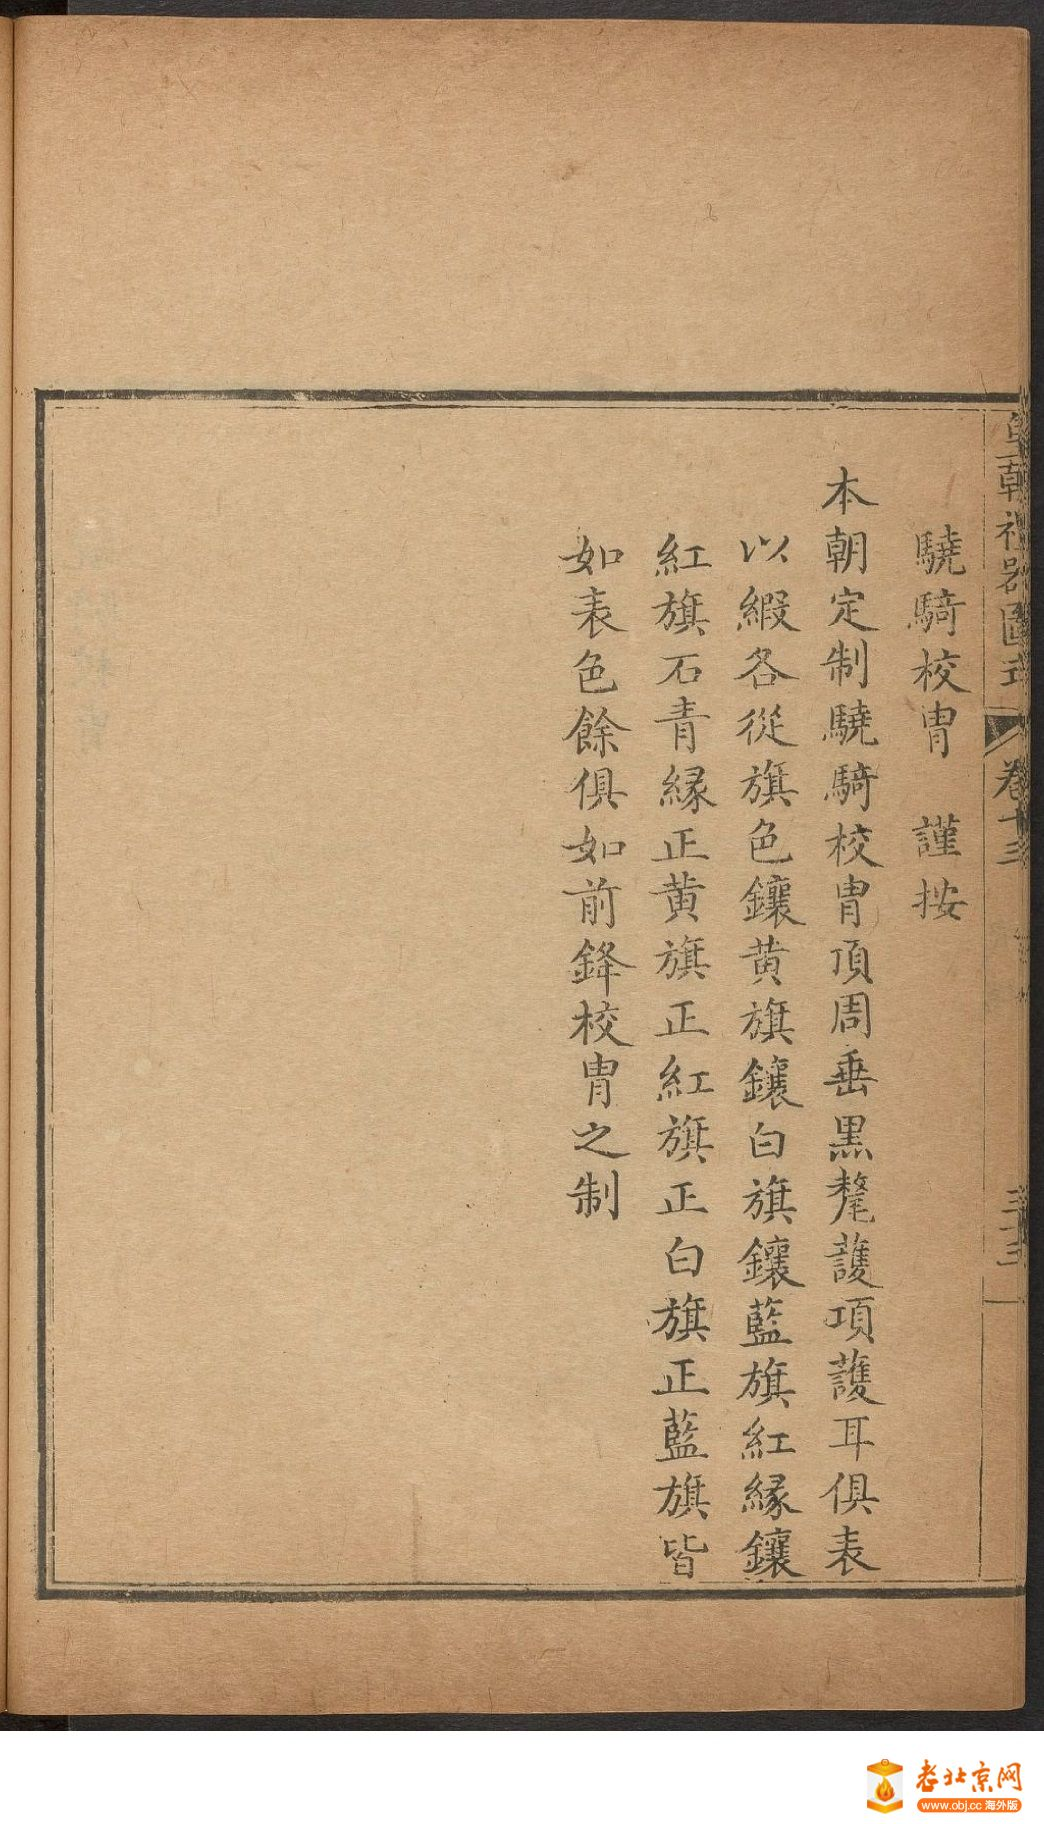 4_page4_image1b.jpg